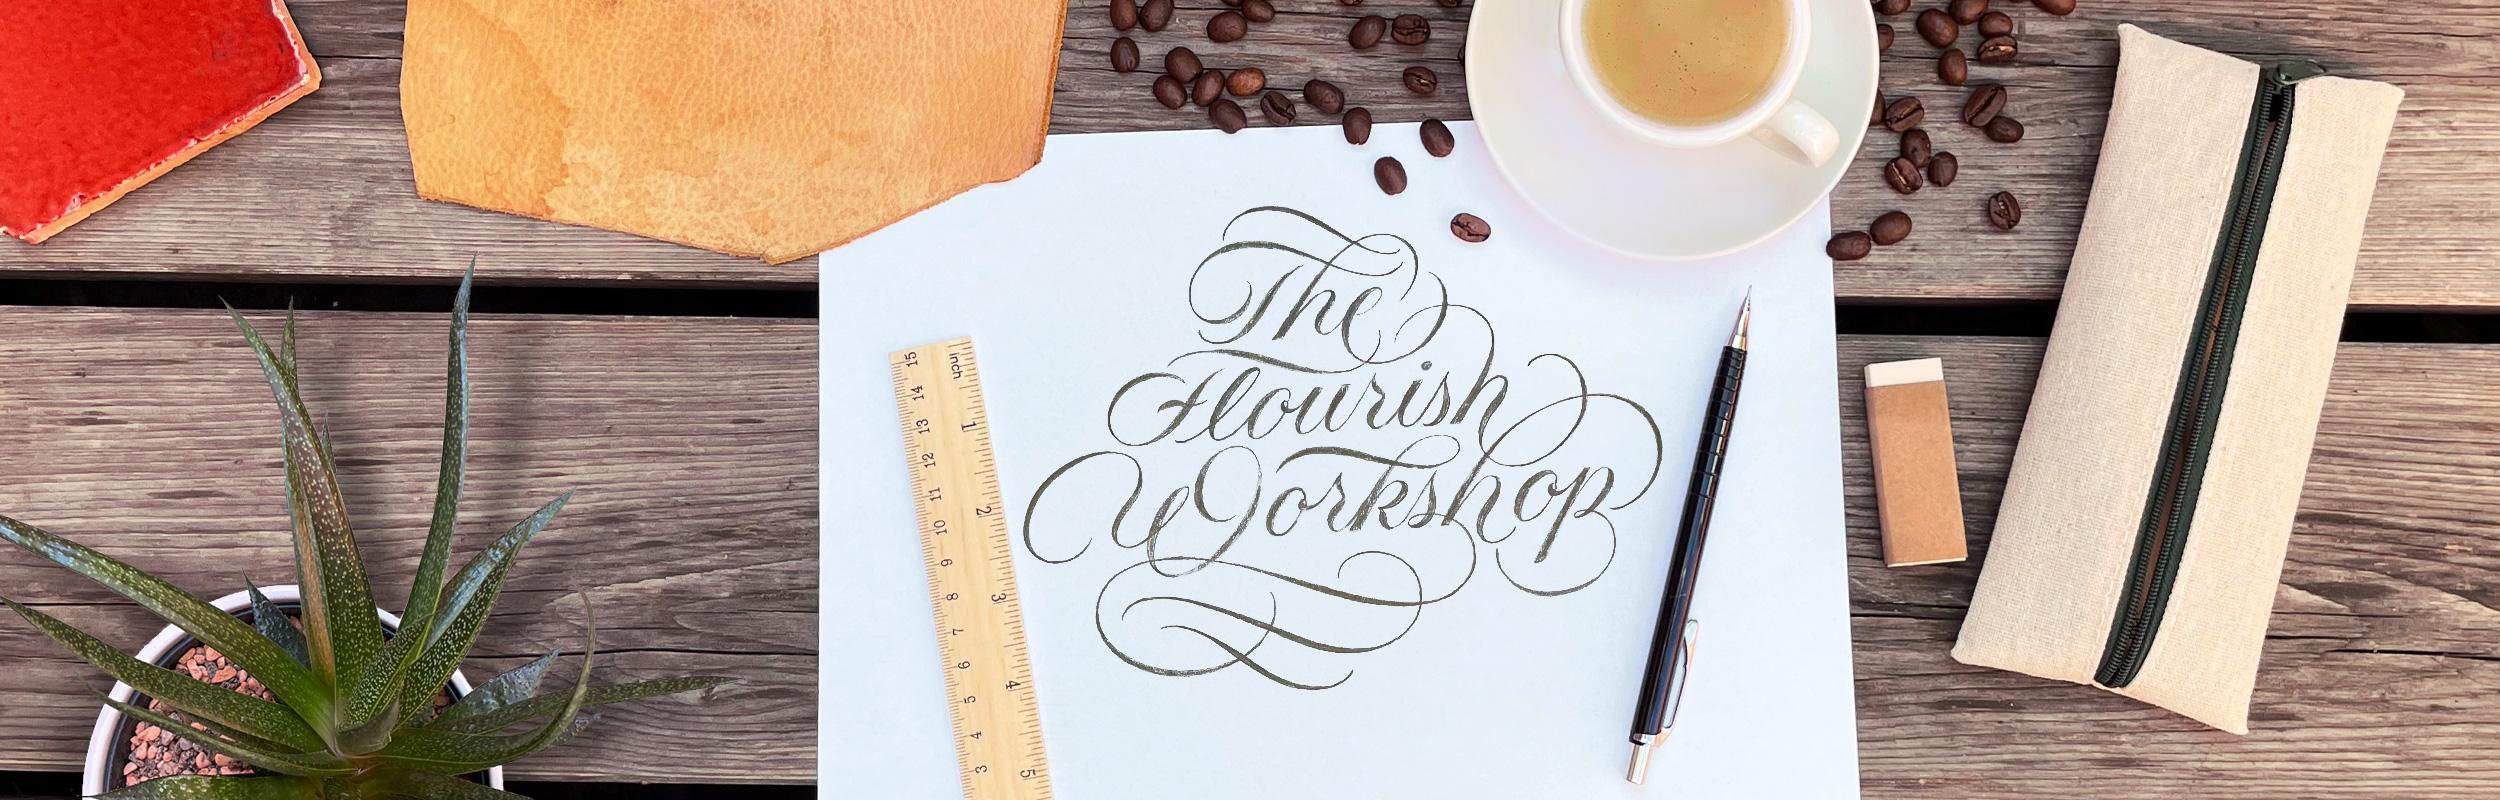 The Flourish Workshop